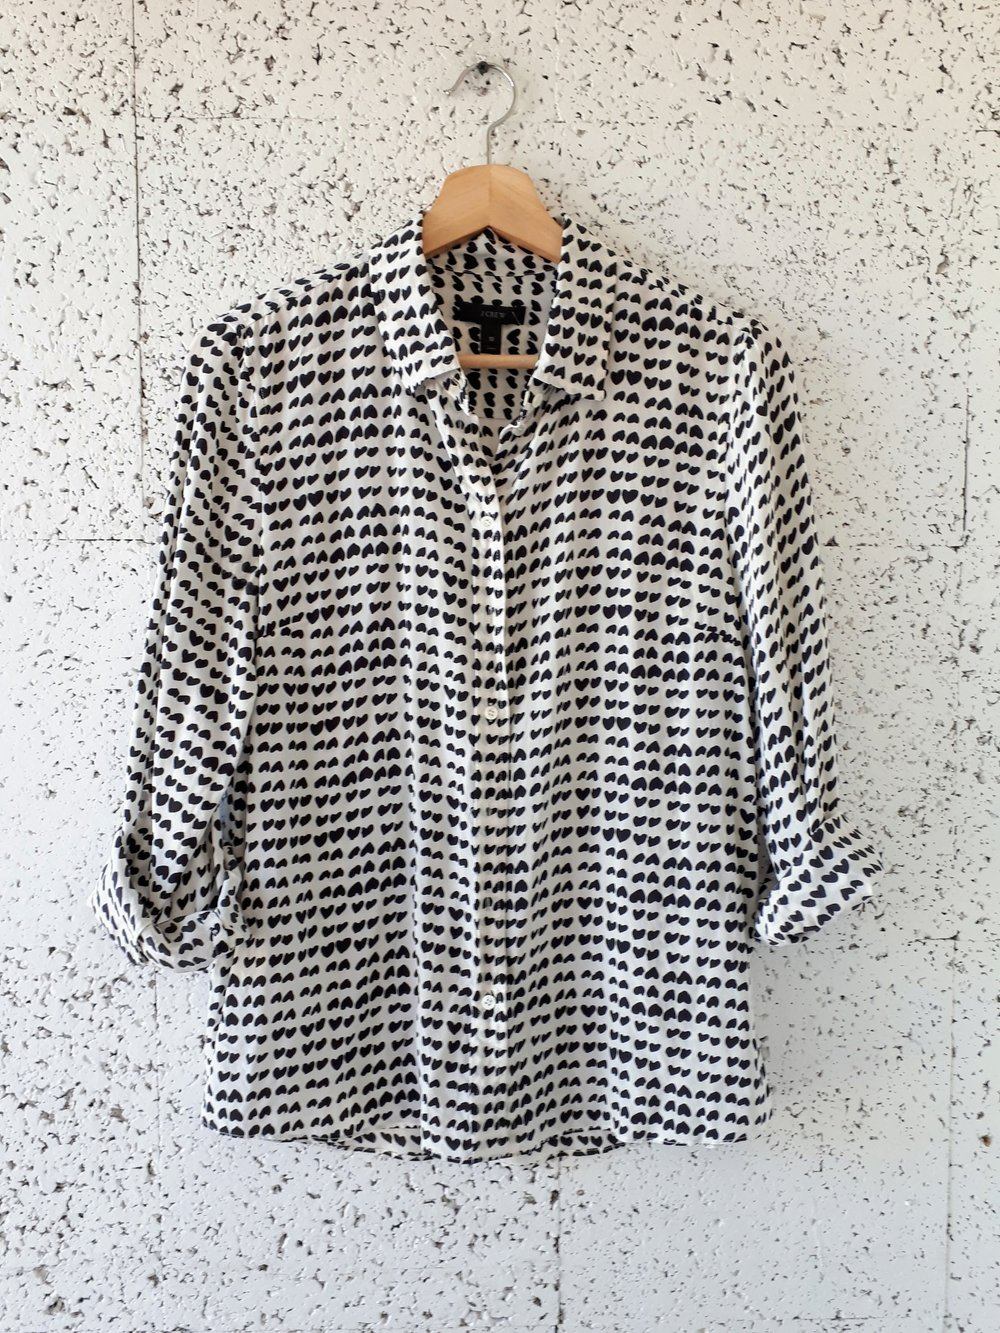 J Crew shirt; Size M, $34